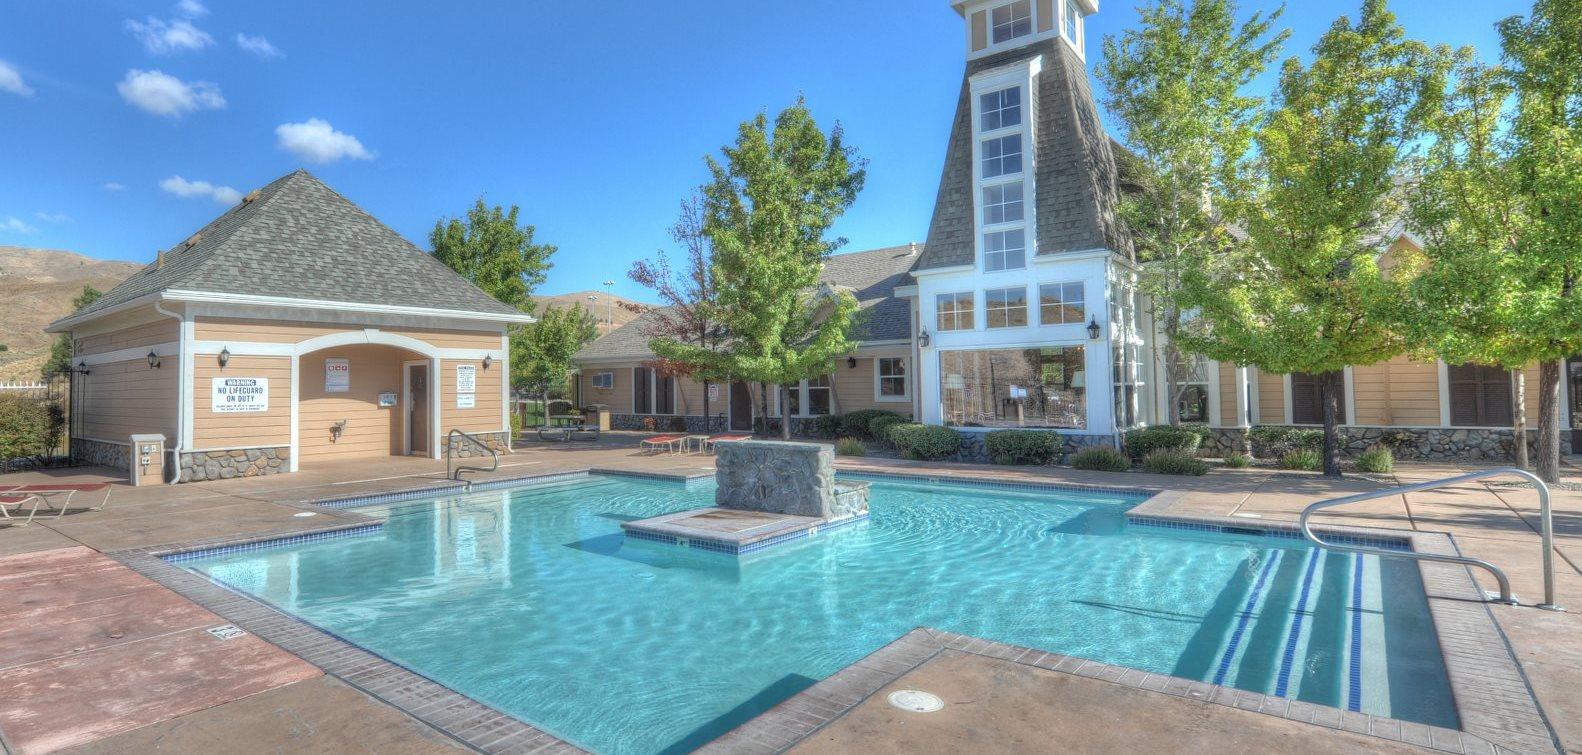 Rent your reno nv apartment home today manzanita gate - City of carson swimming pool carson ca ...